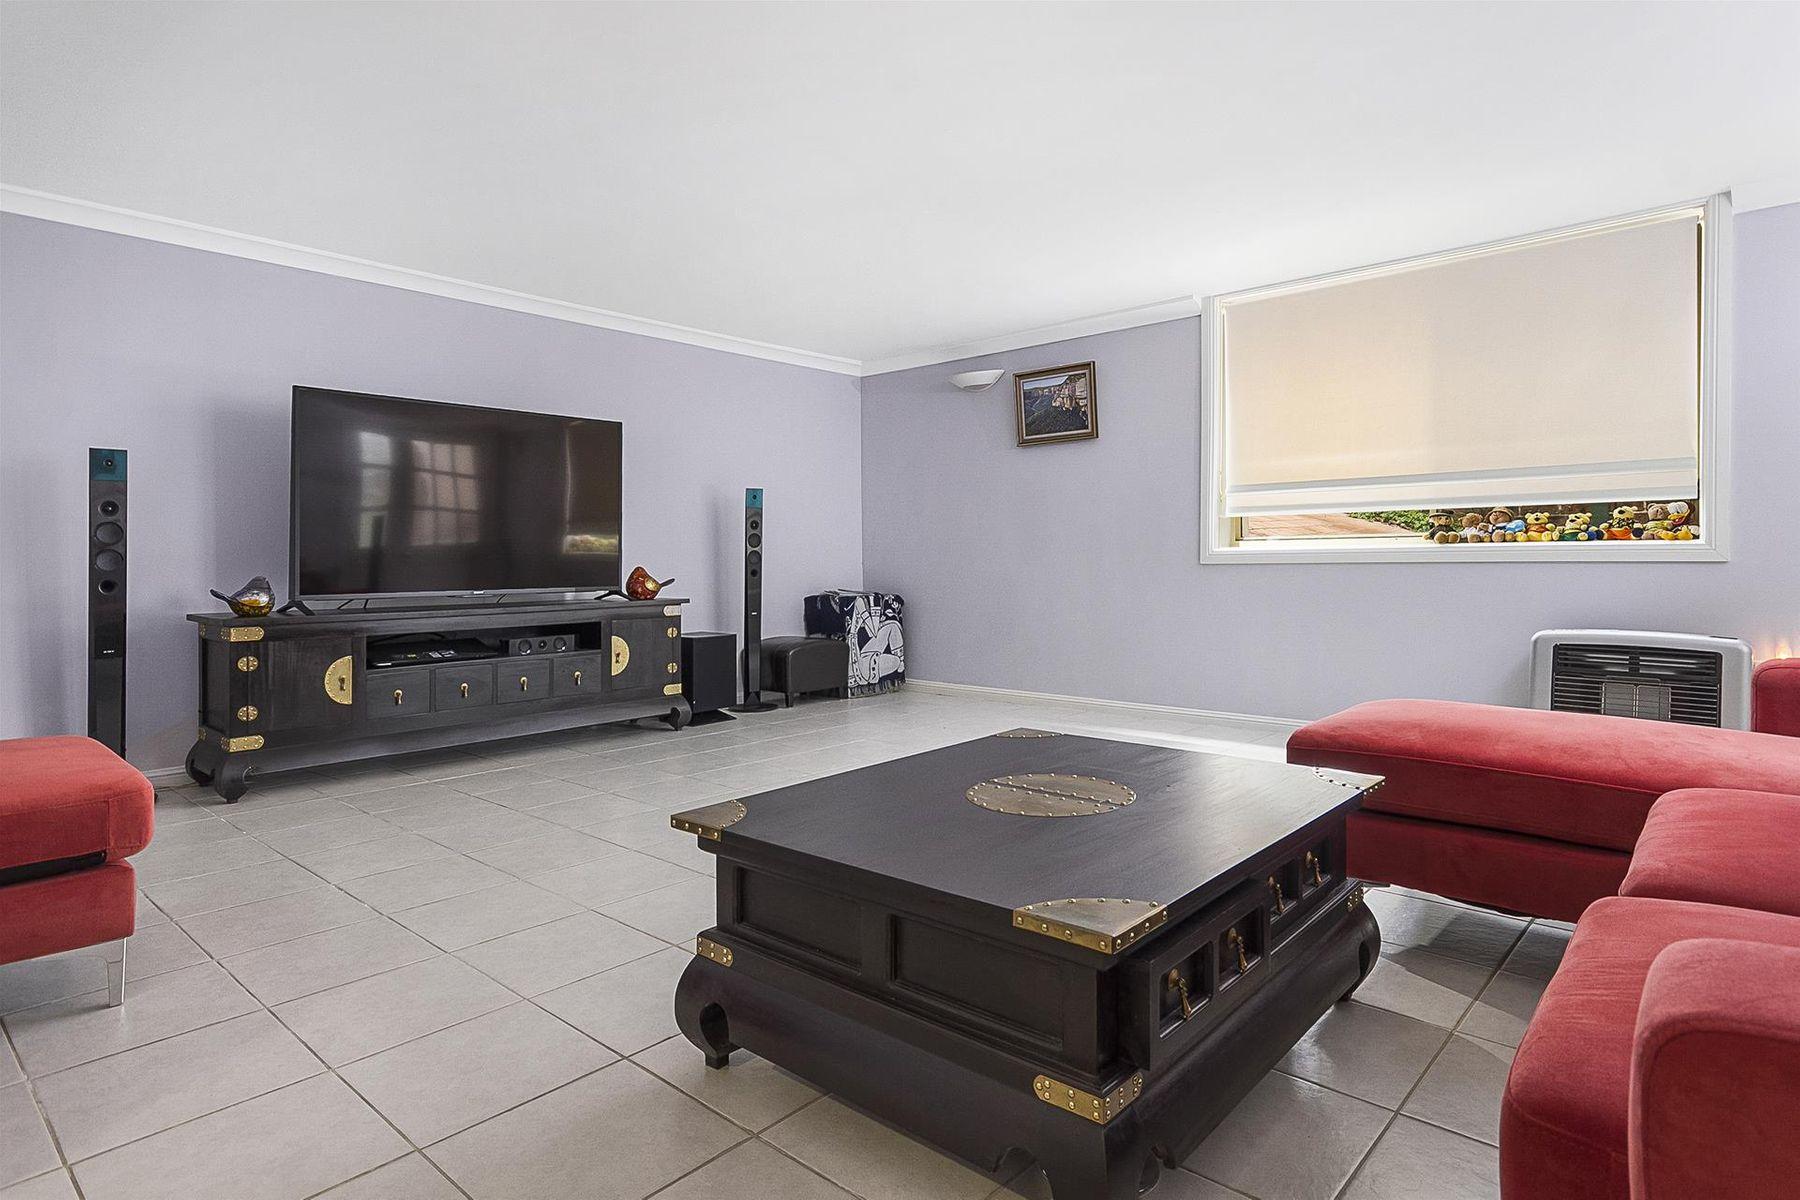 2/36 Alana Drive, West Pennant Hills, NSW 2125